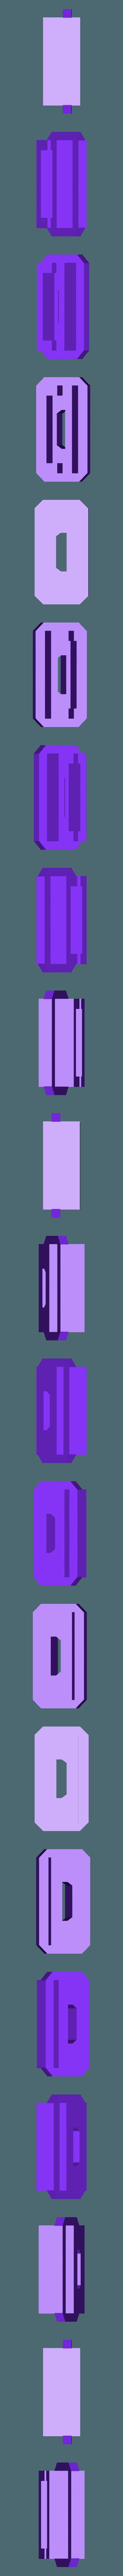 Remate MUSB.stl Download free STL file Otg flash drive case • 3D print template, Loren